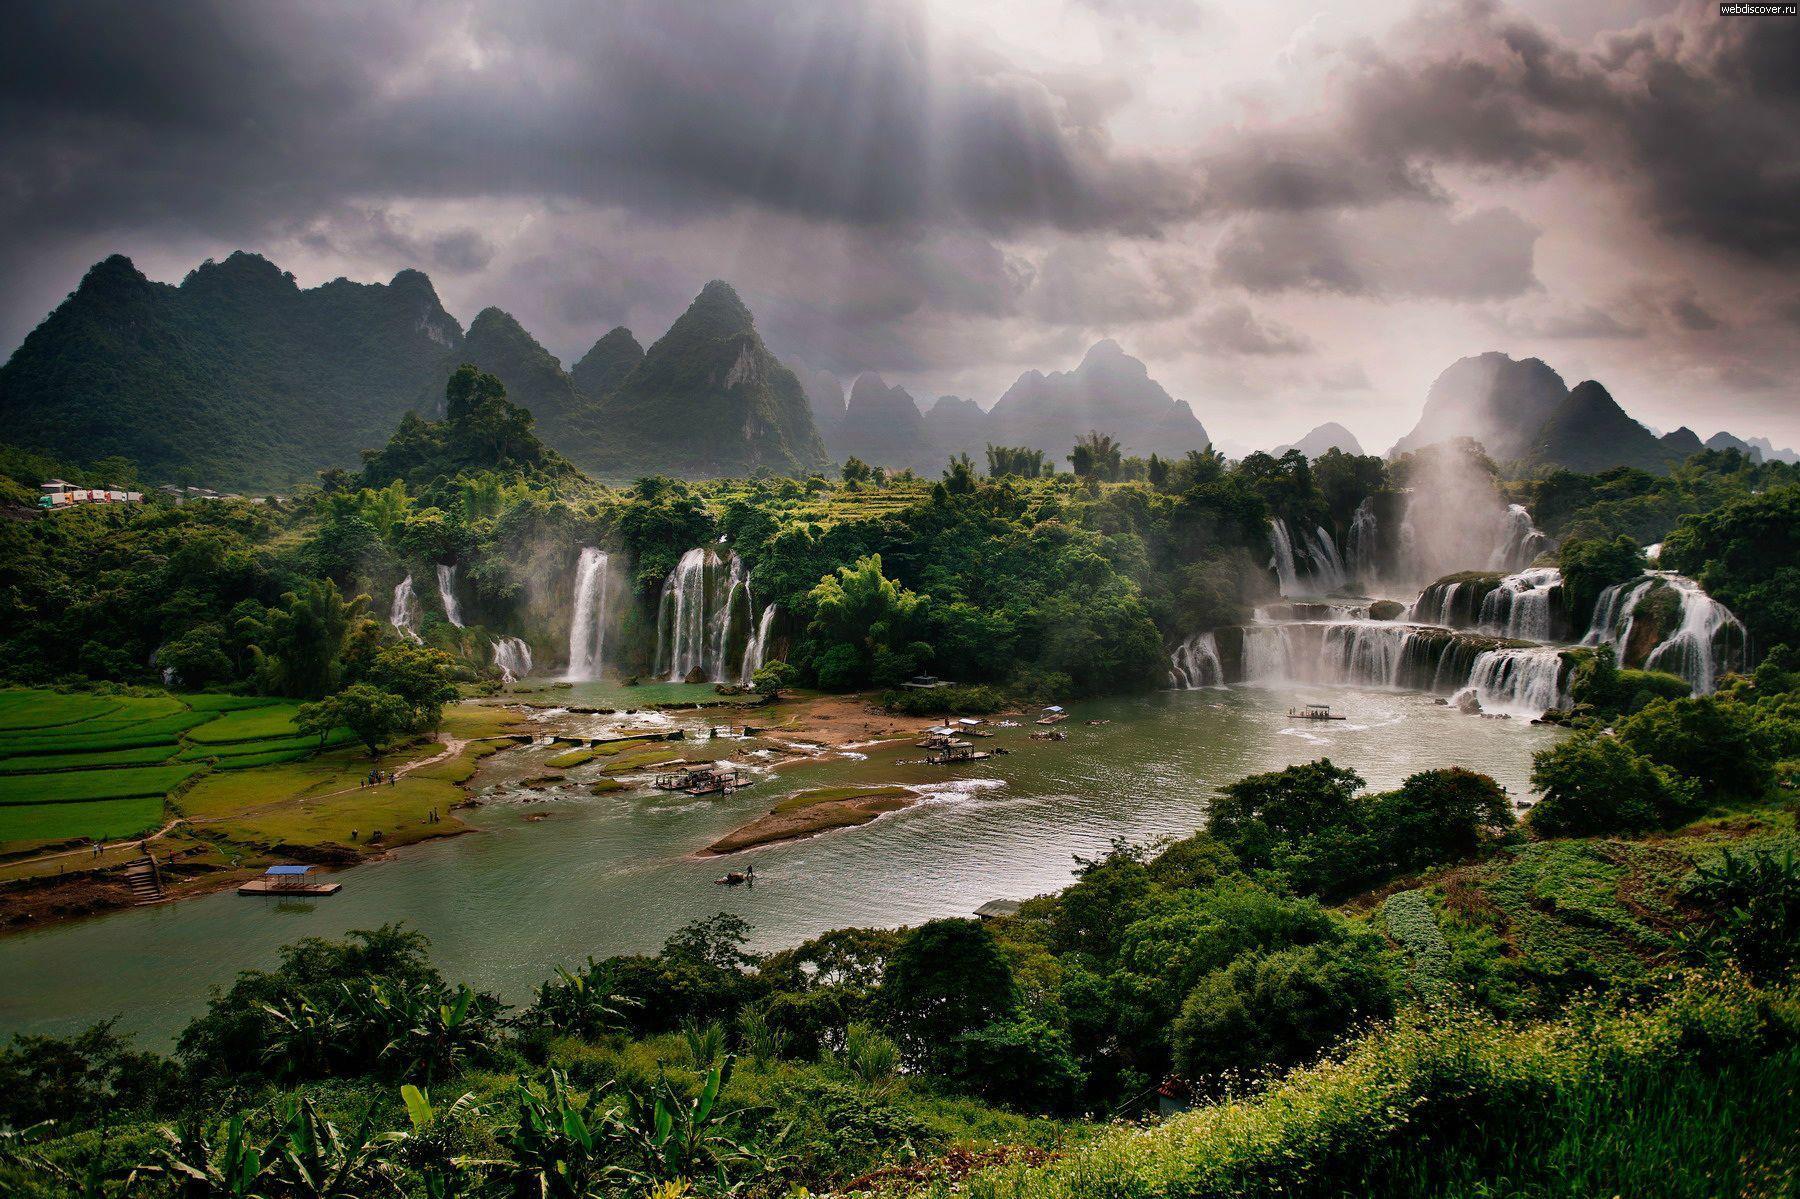 Провинция Гуанси